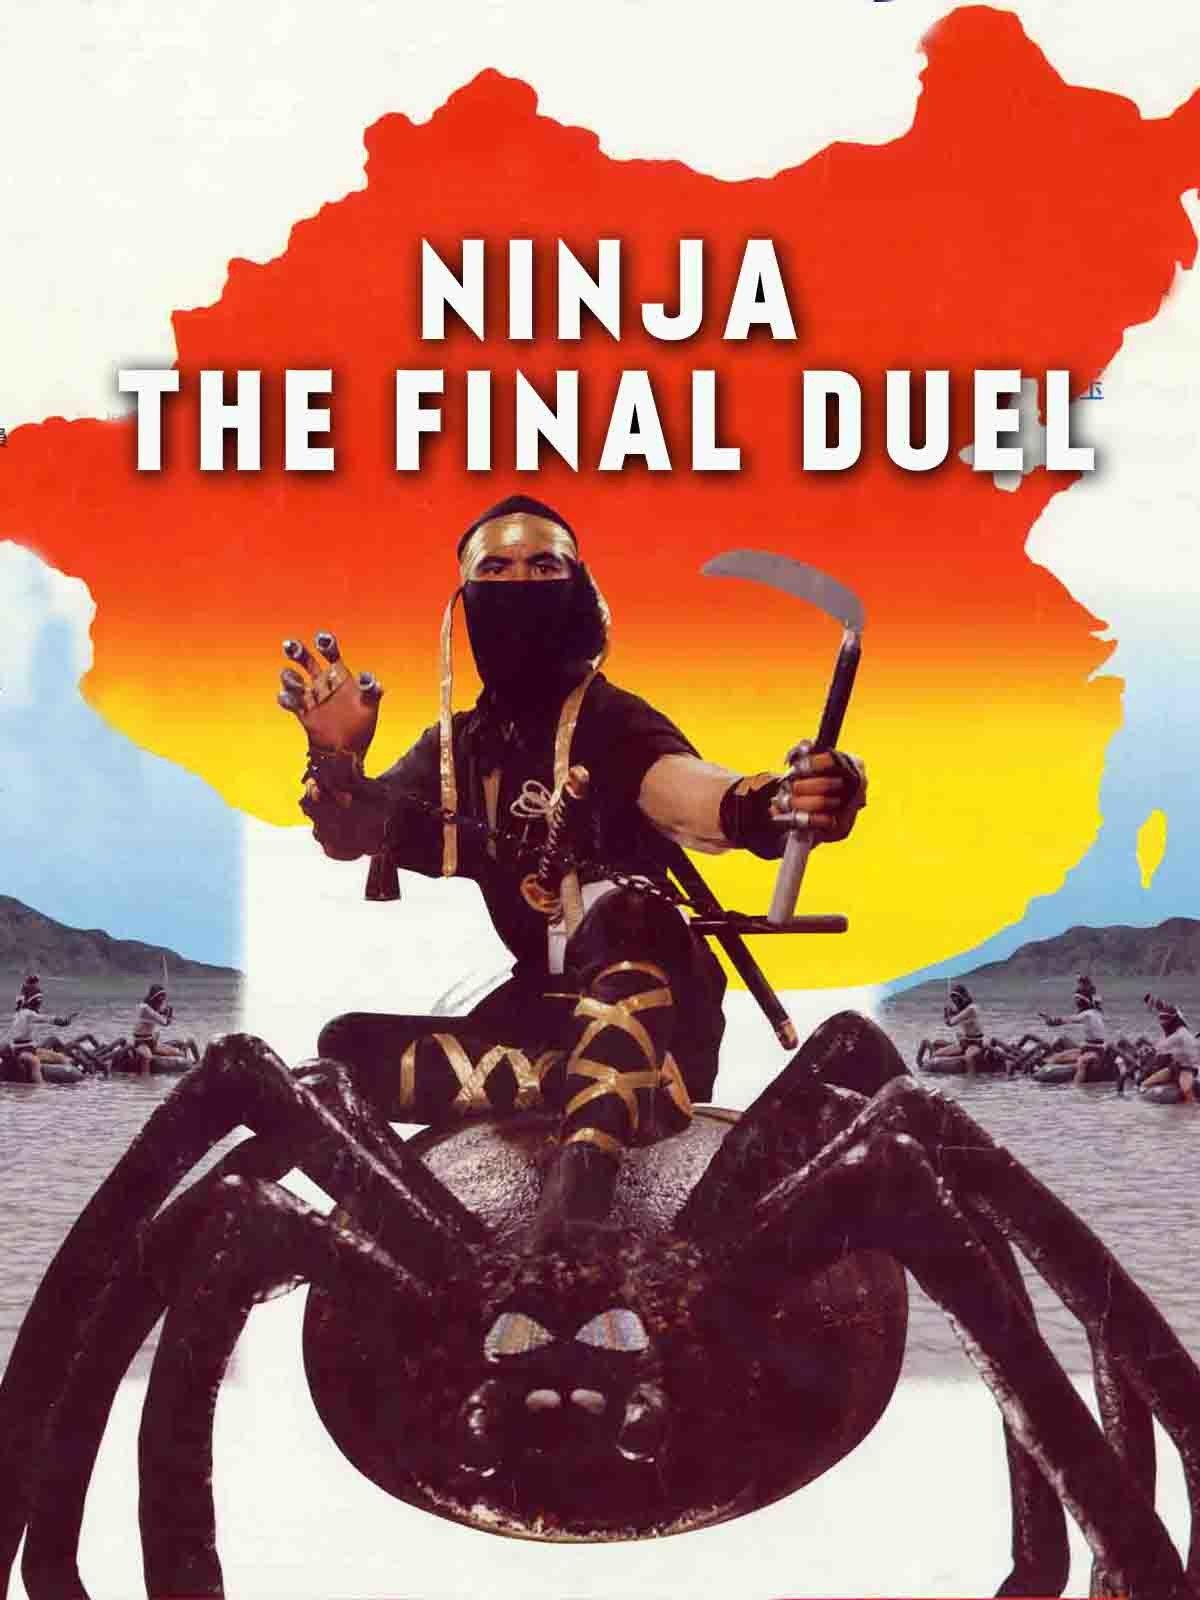 Watch Ninja The Final Duel | Prime Video